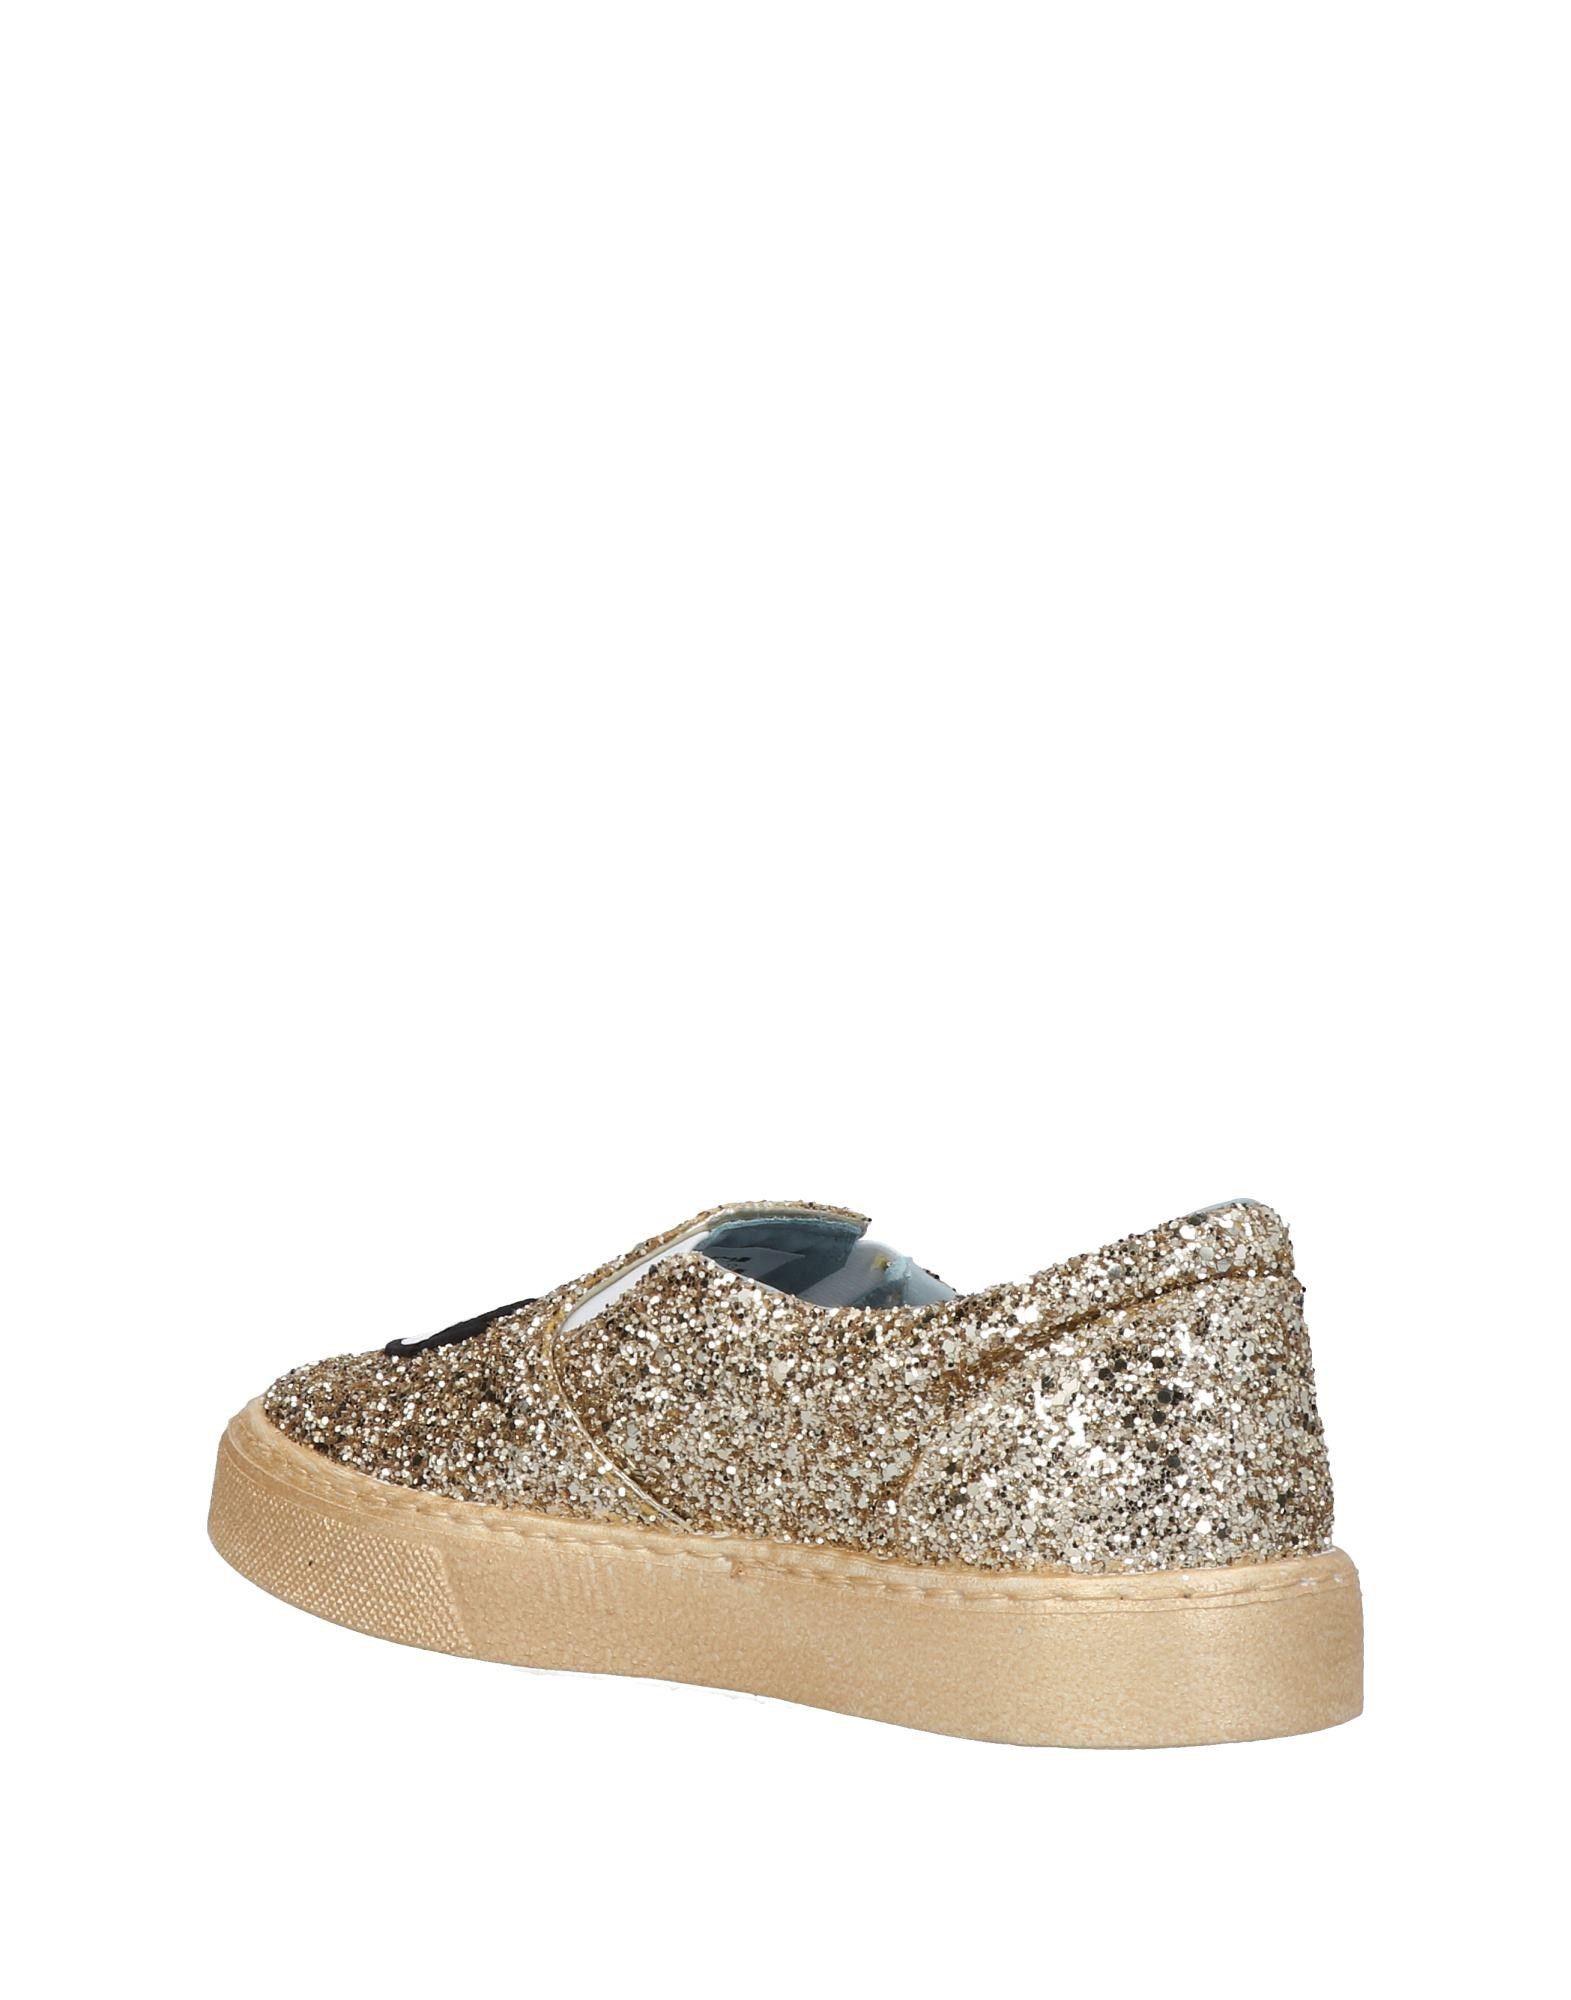 Stilvolle billige Schuhe Damen Chiara Ferragni Sneakers Damen Schuhe  11452593FX c12ede